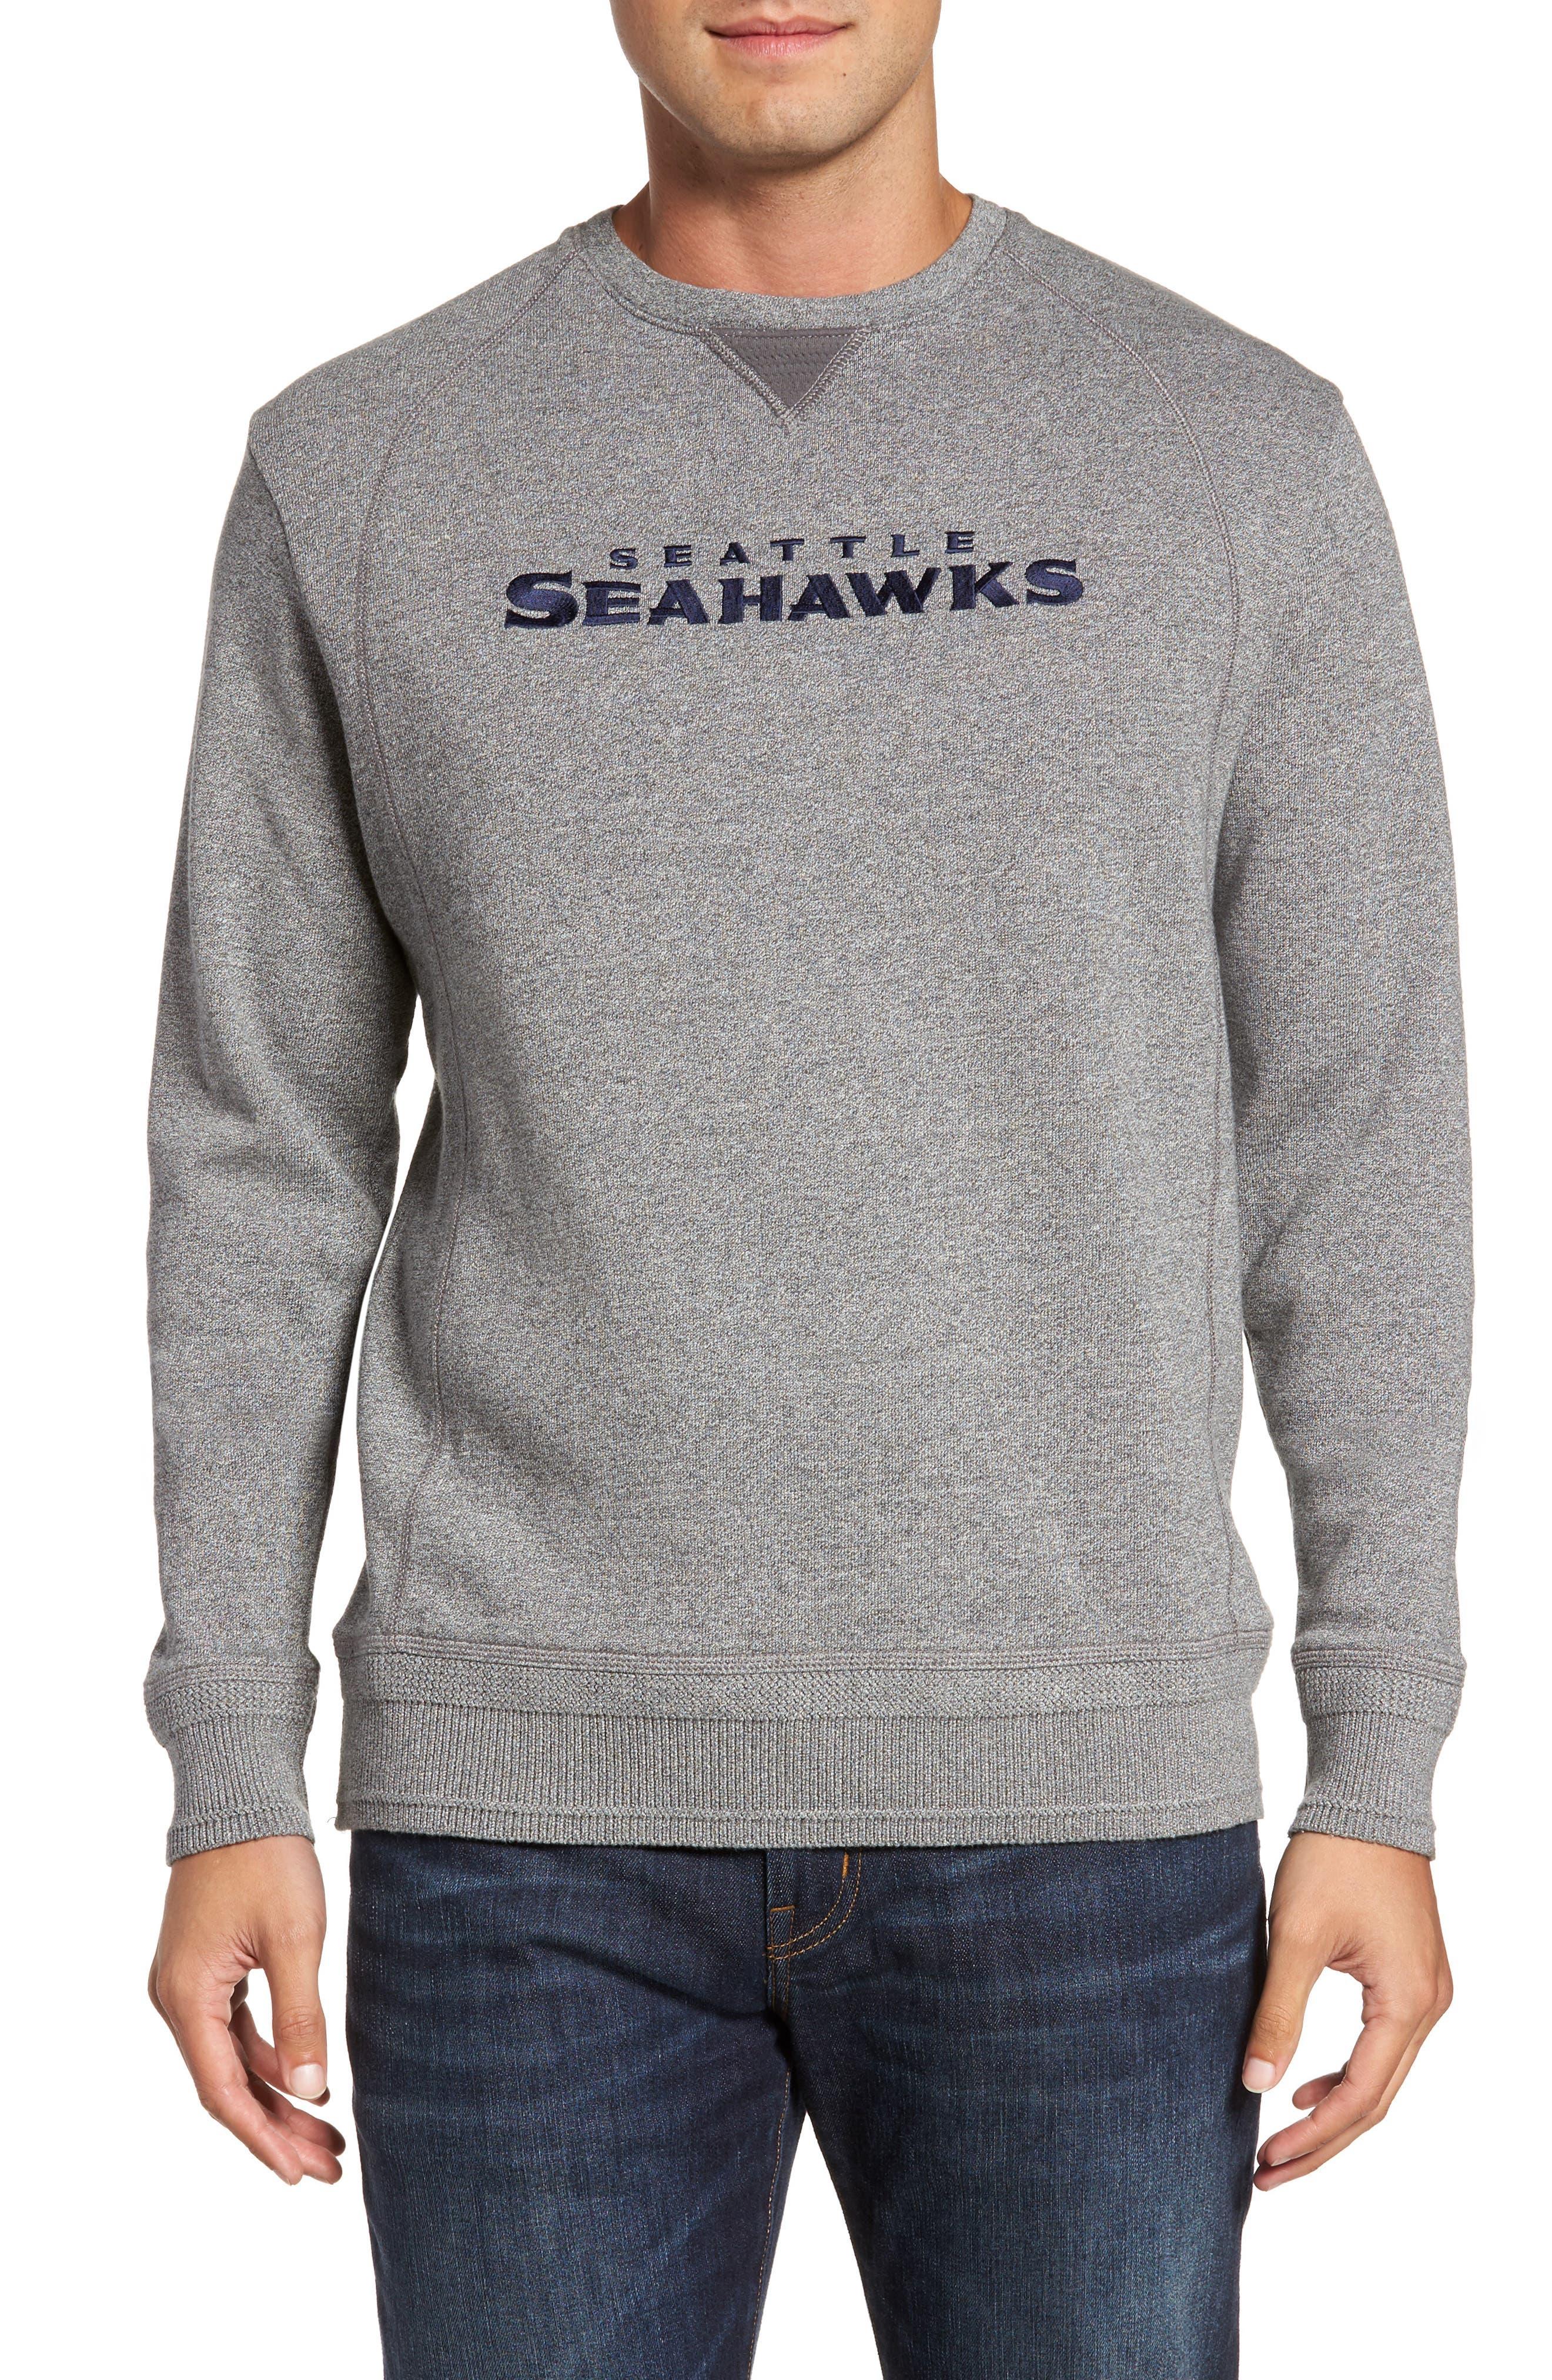 Main Image - Tommy Bahama NFL Stitch of Liberty Embroidered Crewneck Sweatshirt